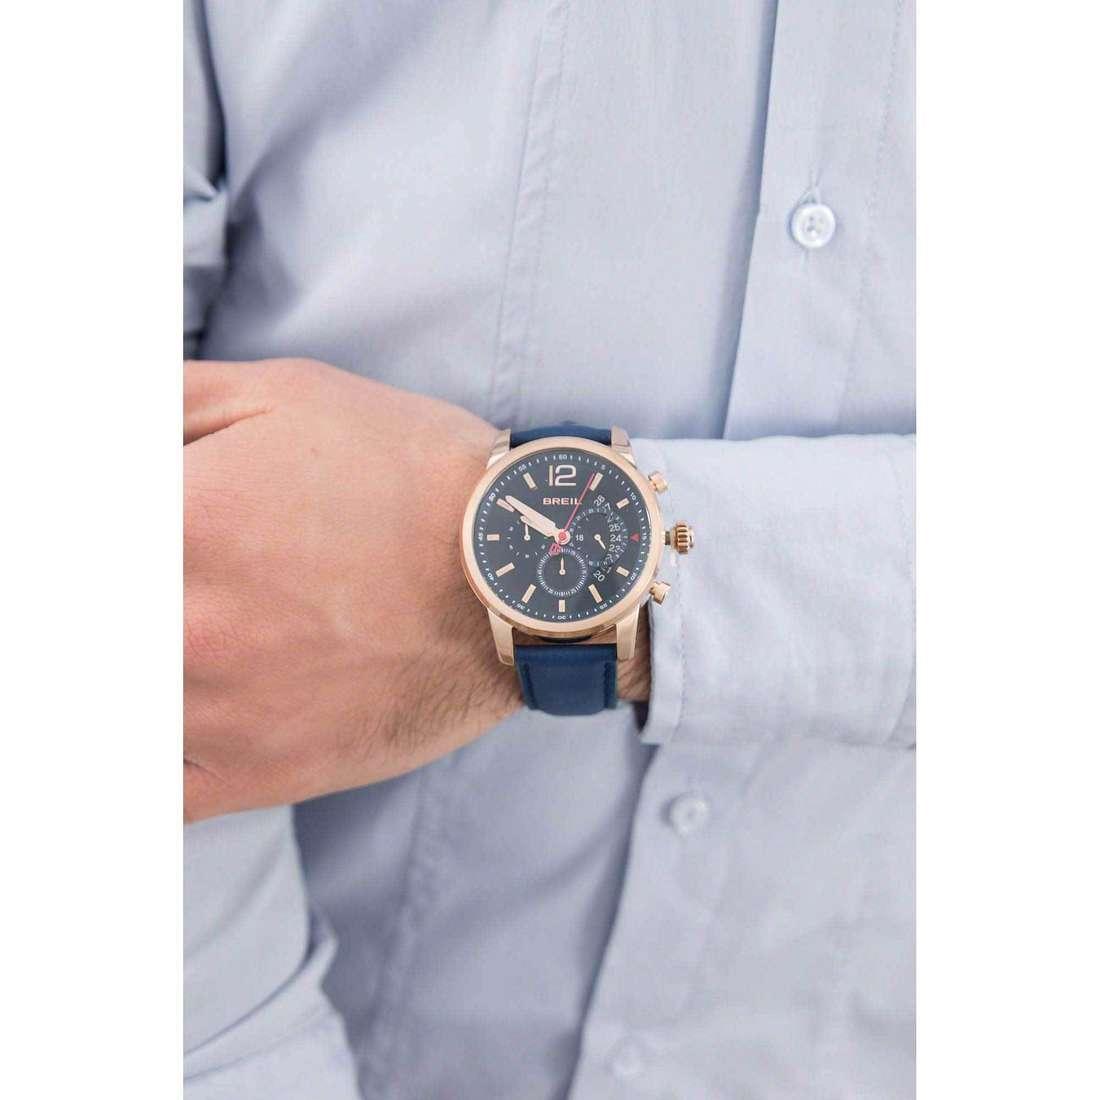 Breil cronografi Miglia uomo TW1373 indosso